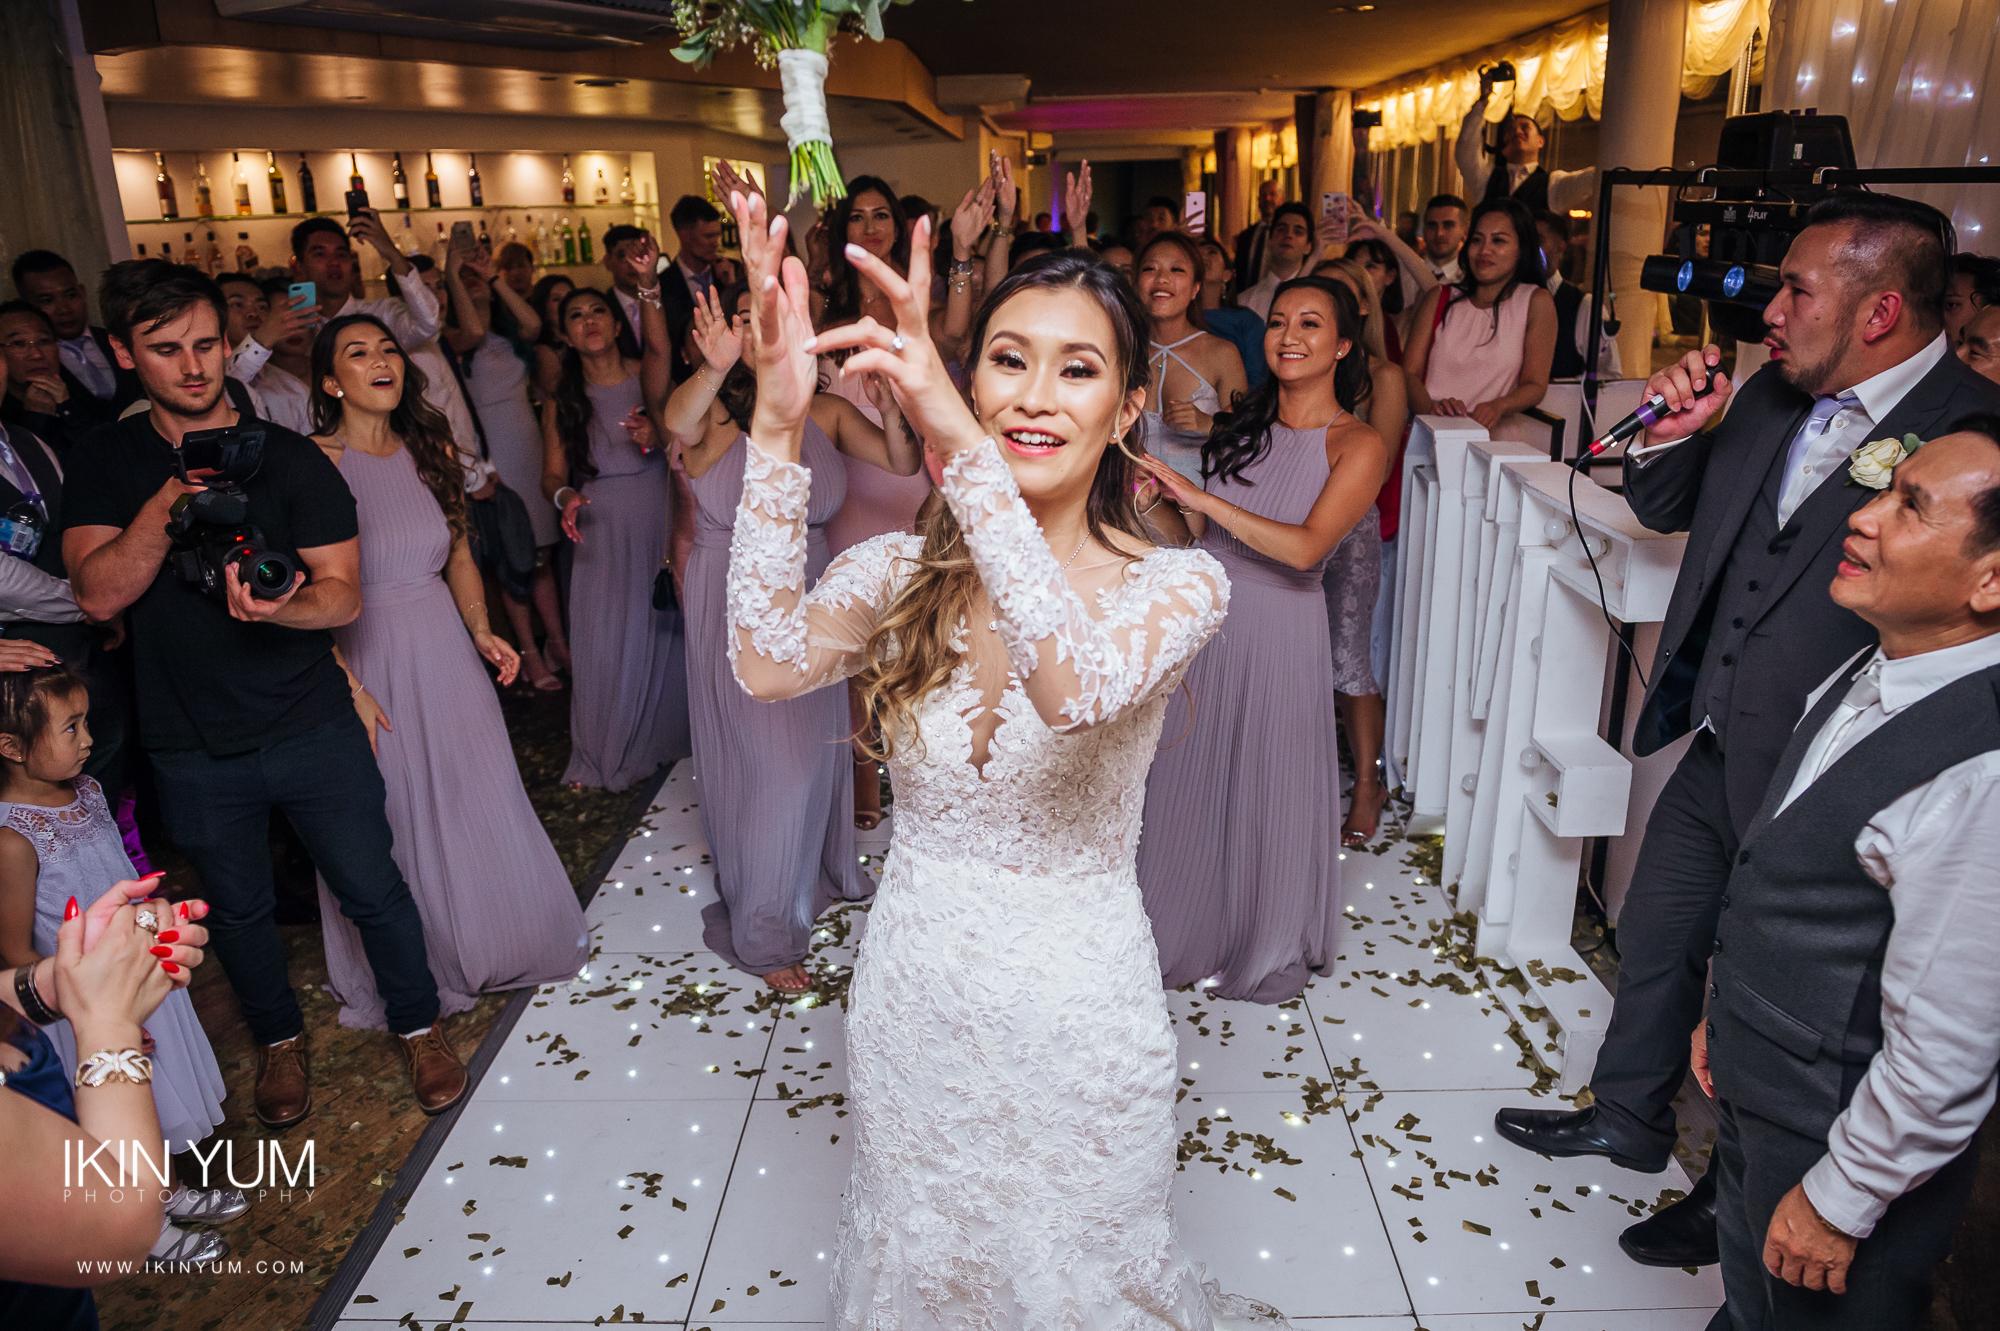 Syon Park Wedding - Ikin Yum Photography -149.jpg